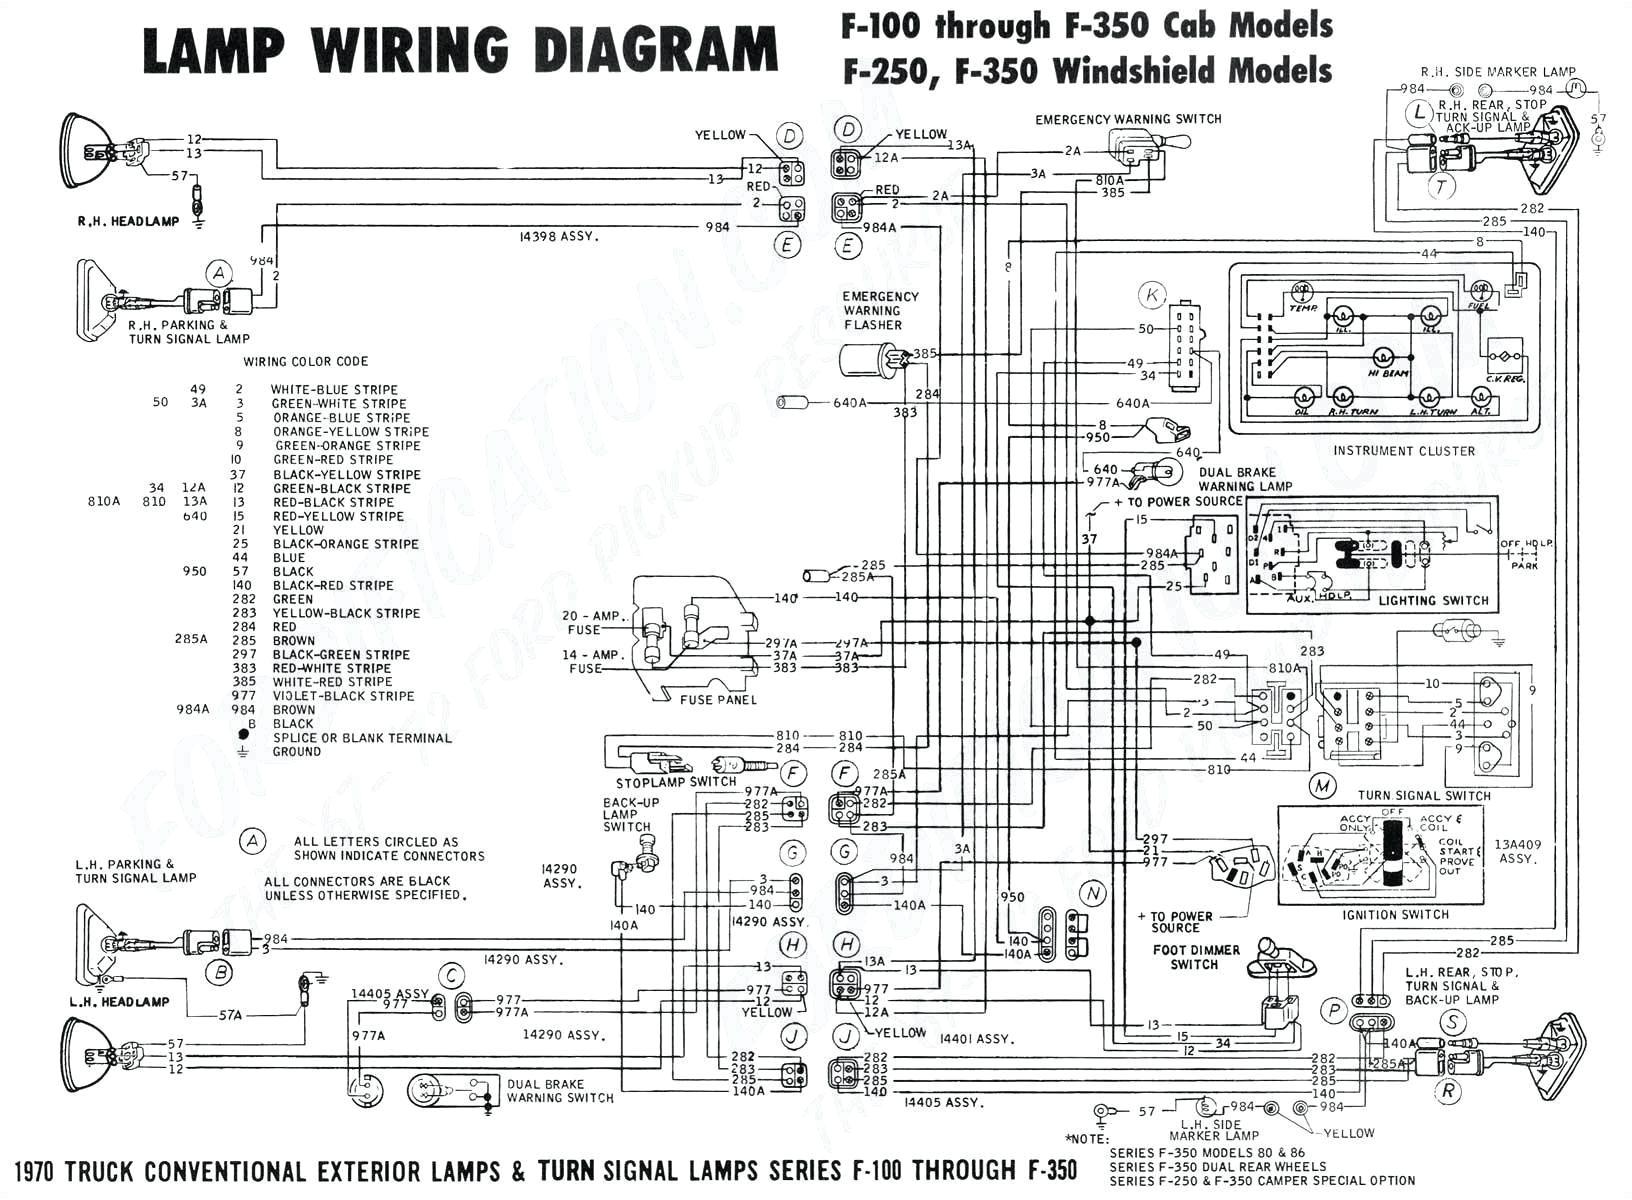 2010 toyota corolla wiring diagram wiring diagram database 2010 toyota corolla parts diagram wiring